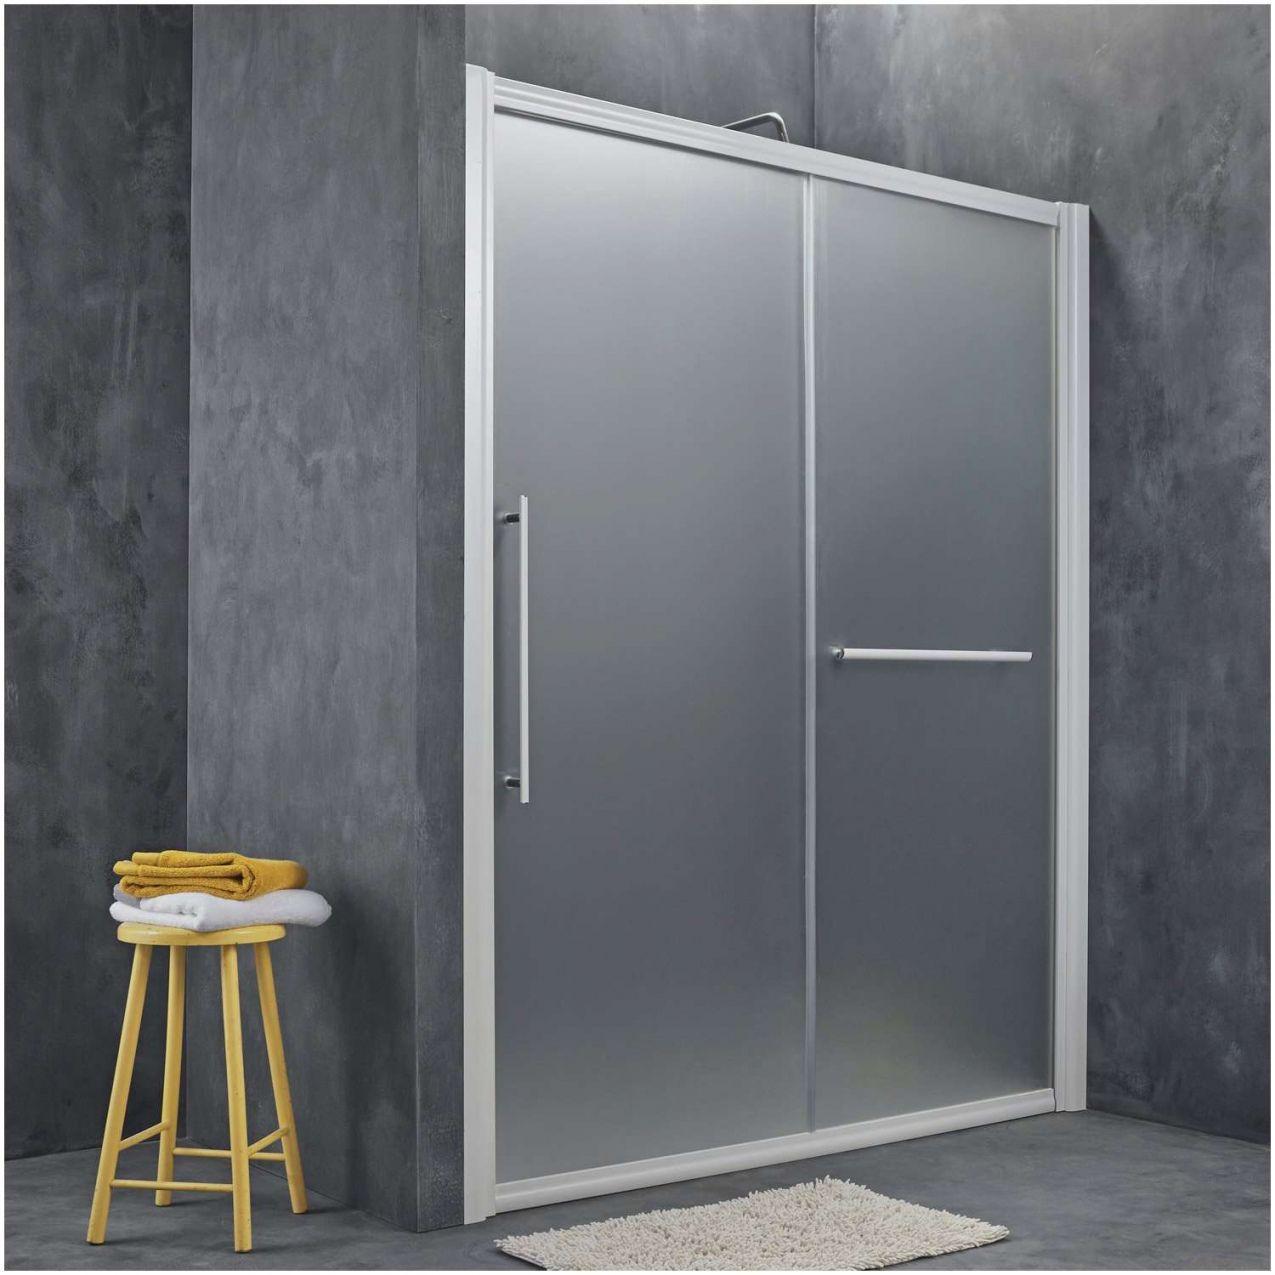 28 Cloison Japonaise Coulissante Ikea 2018 Check More At Https Www Unionjacktrooper Com 99 Cloison Japona Locker Storage Tall Cabinet Storage Kitchen Design